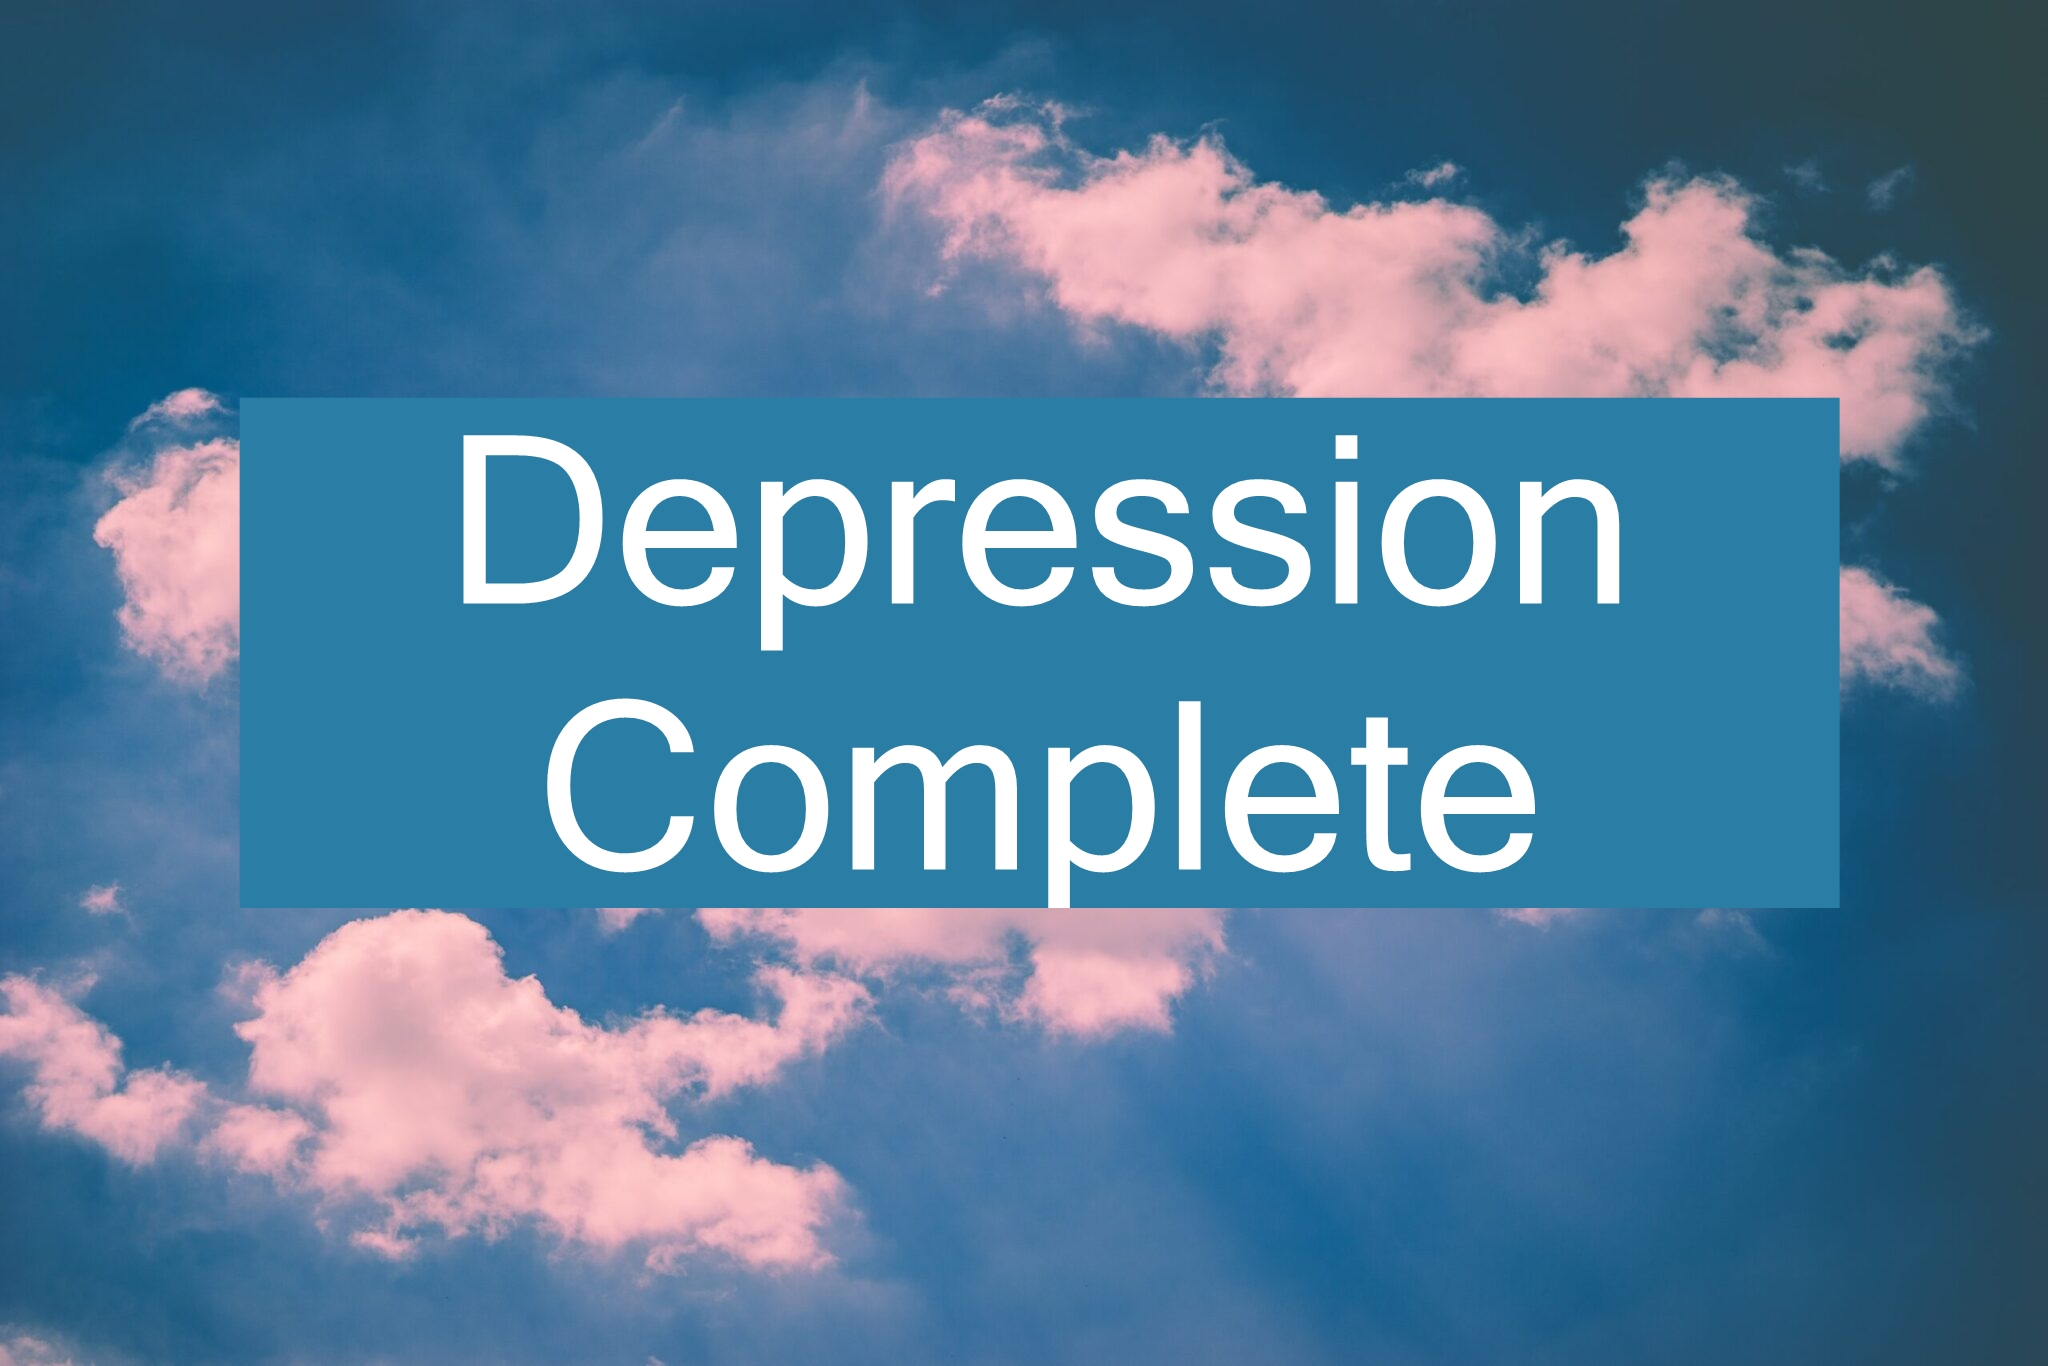 depression complete